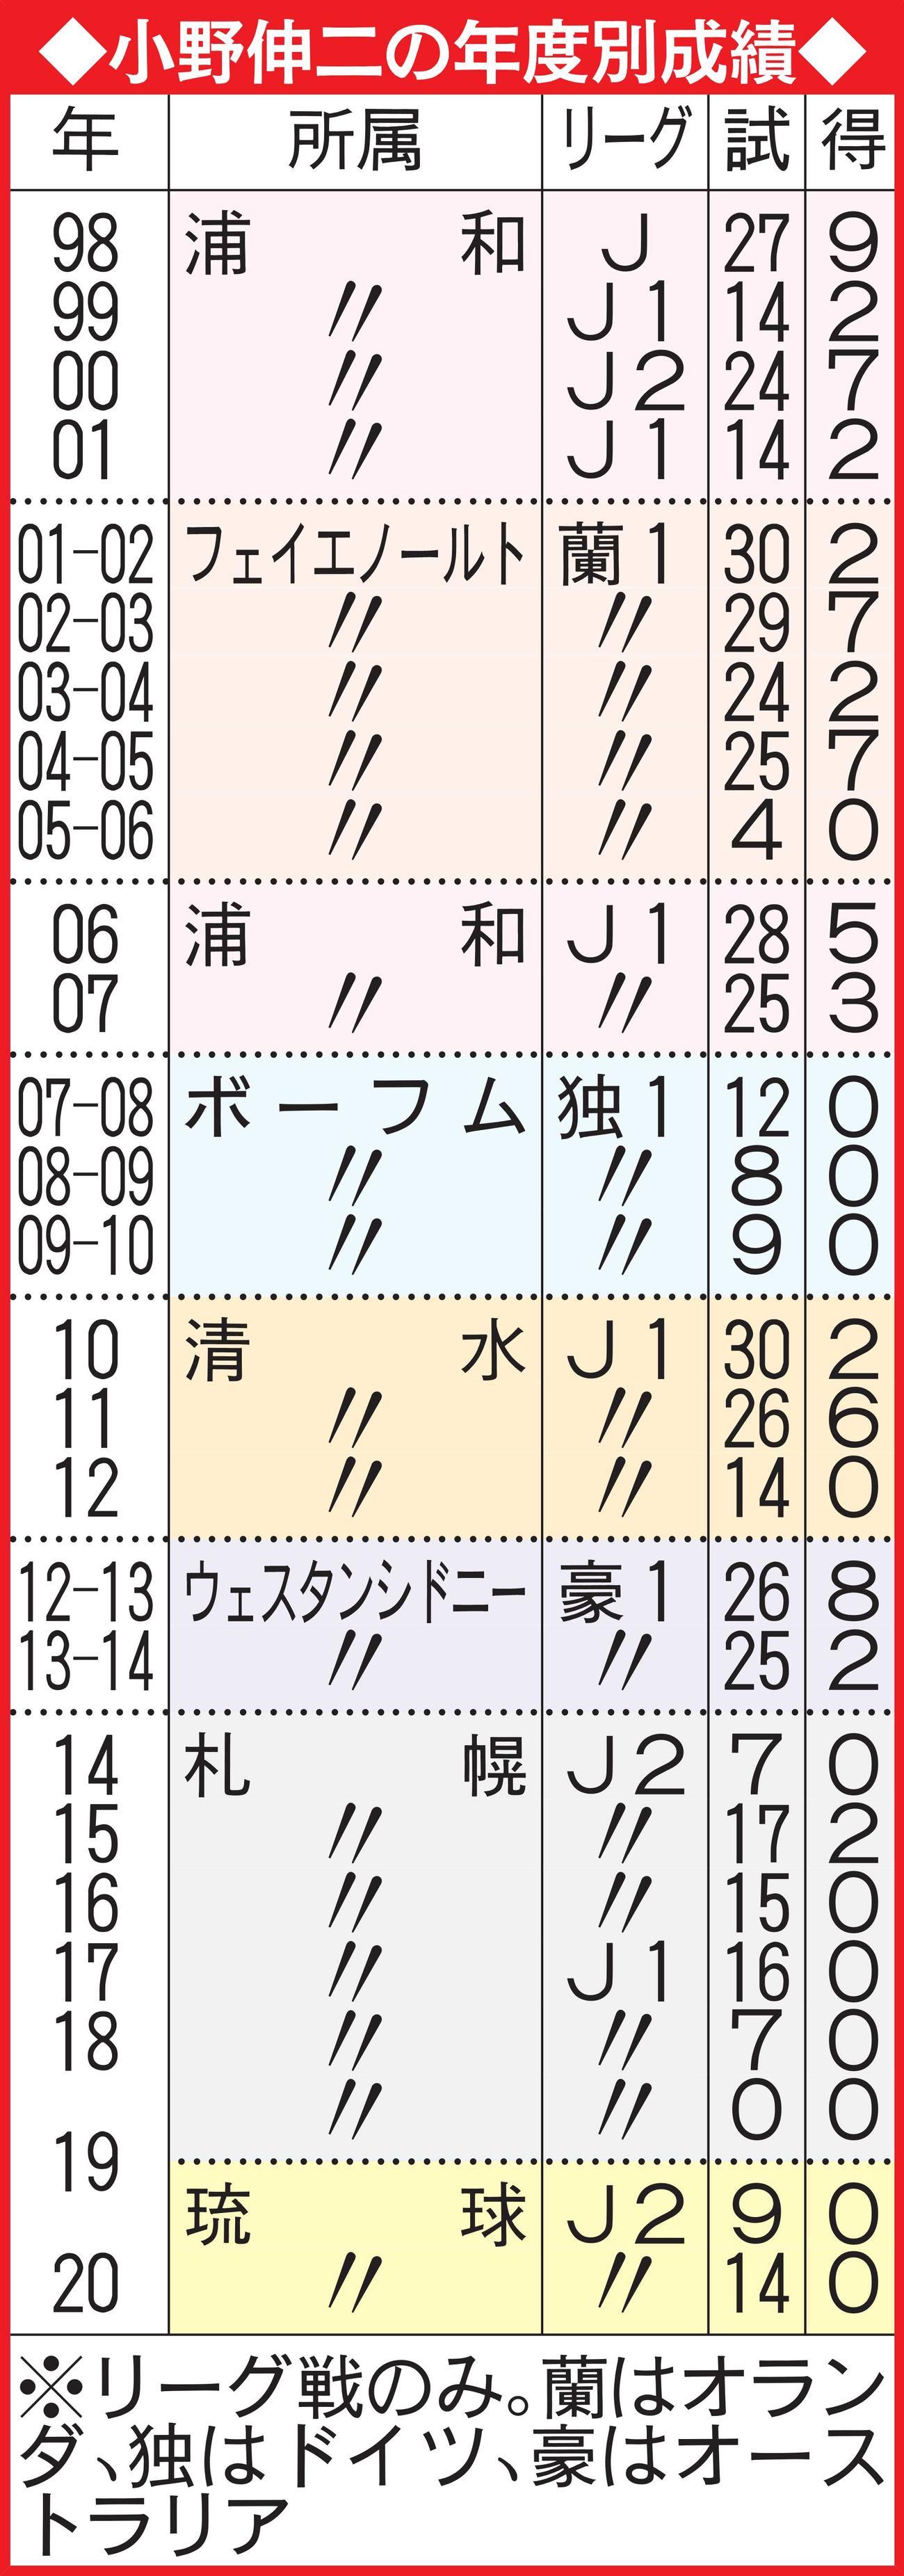 小野伸二の年度別成績